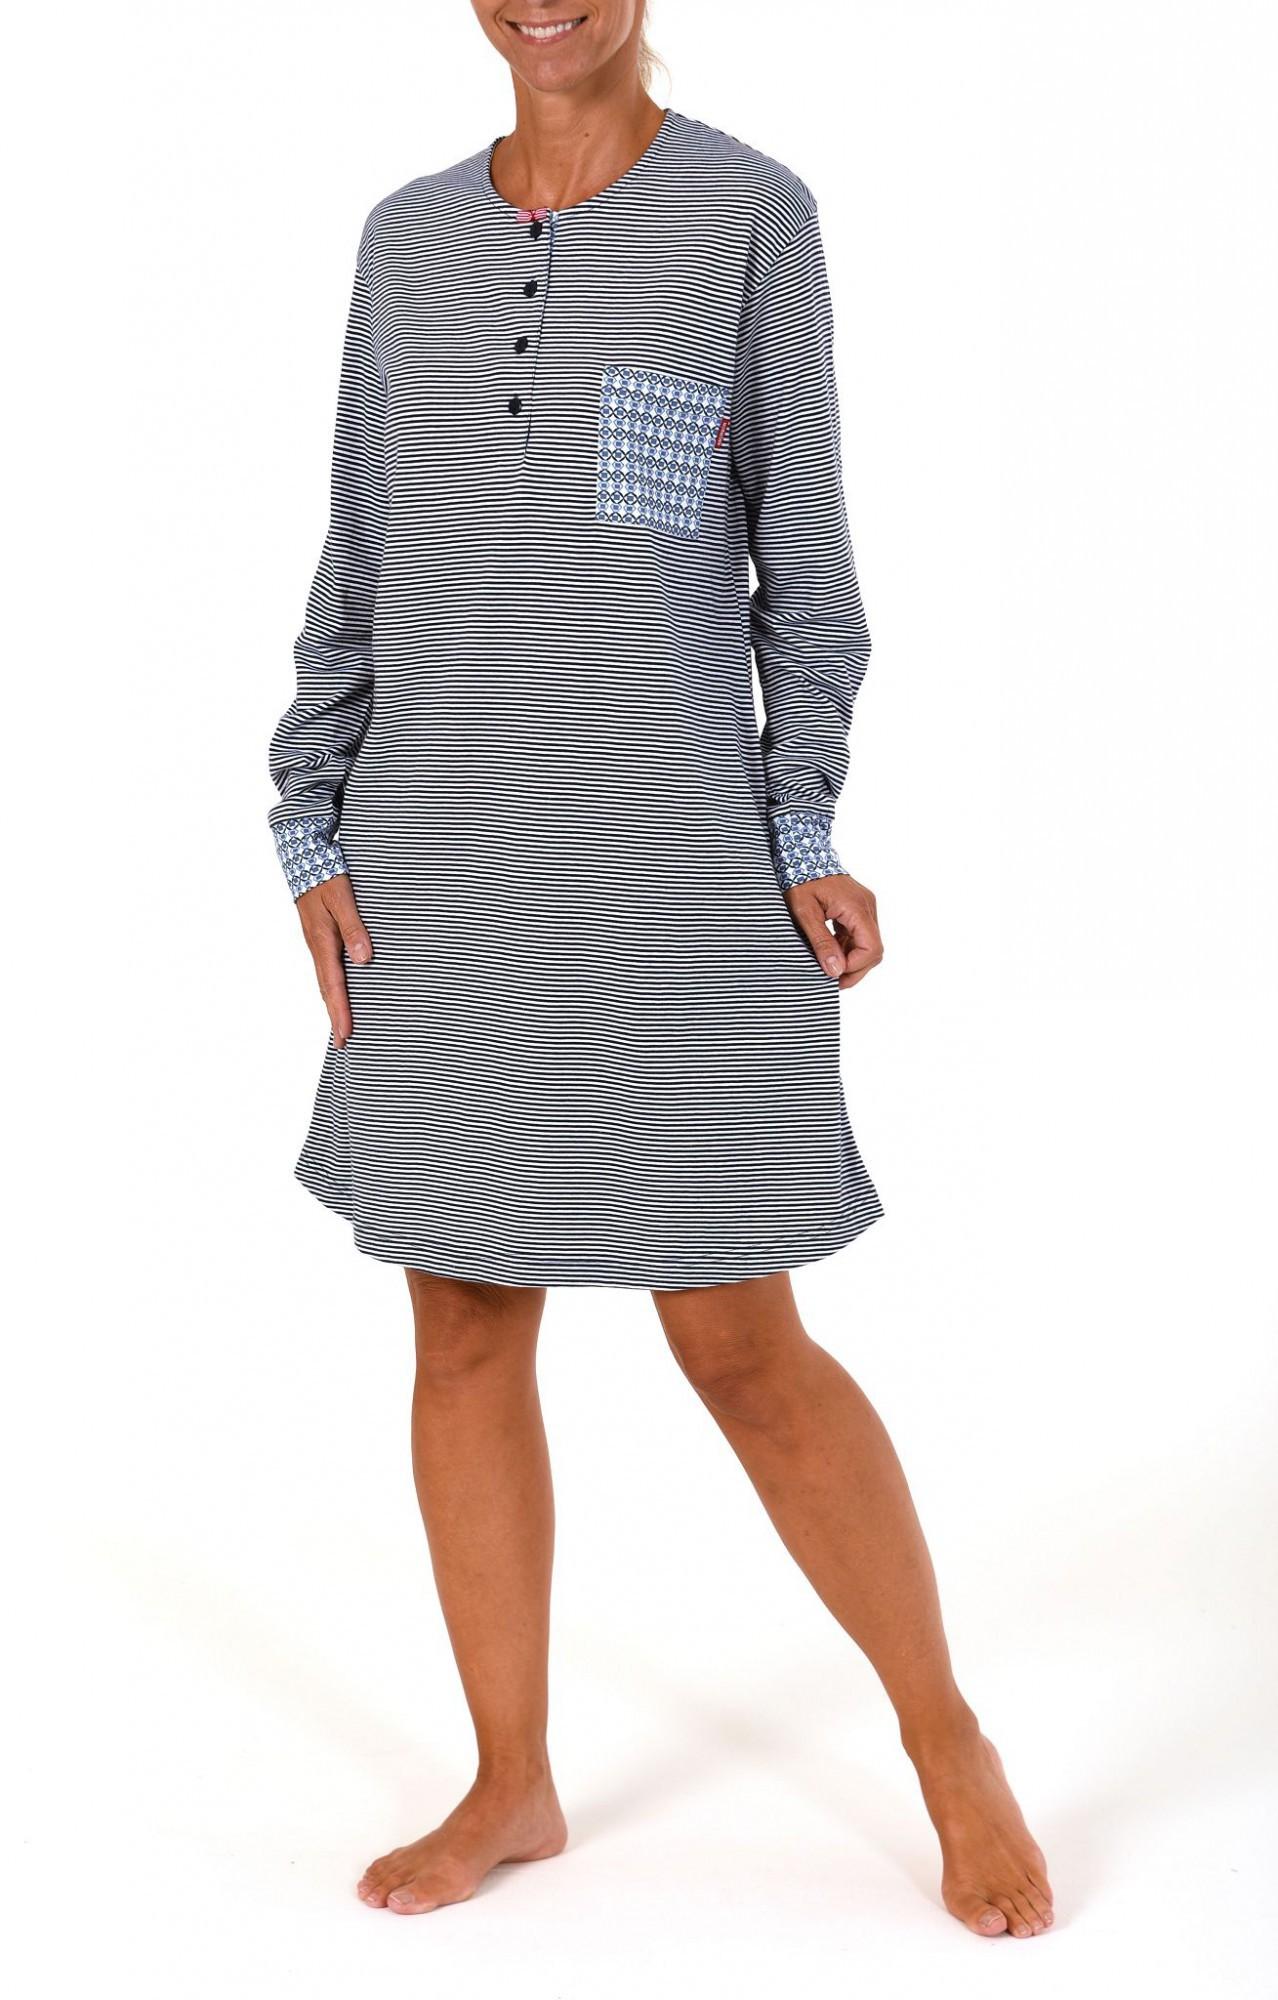 Cooles Damen Nachthemd langarm mit Bündchen – 59600